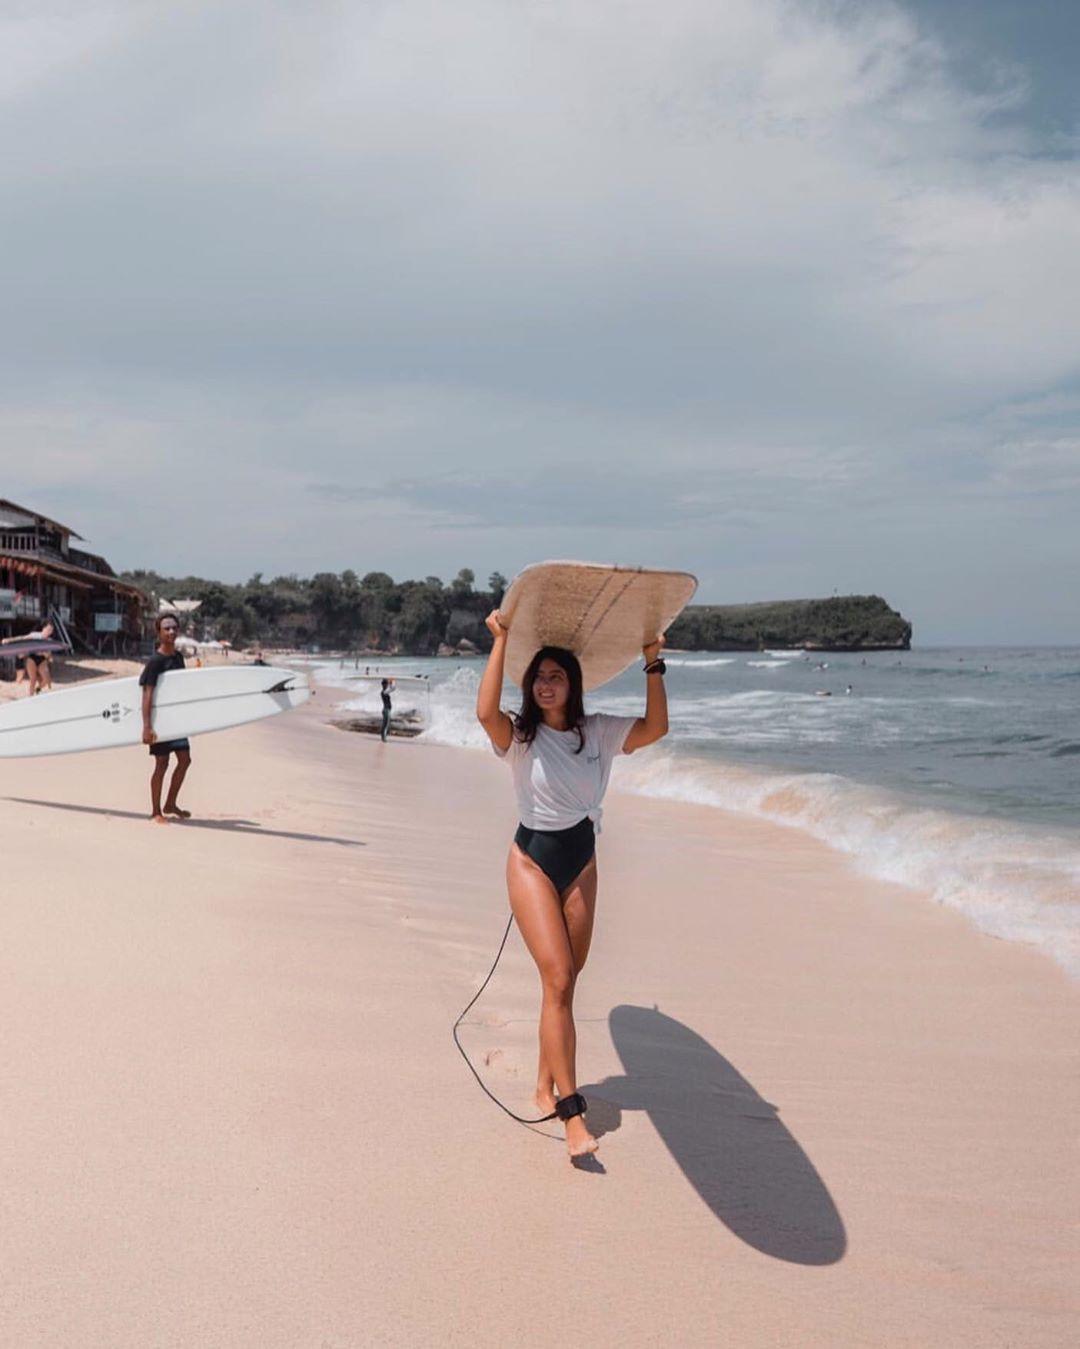 Pantai Balangan Cocok Untuk Surving Pemula dan Profesional - Dewata ID